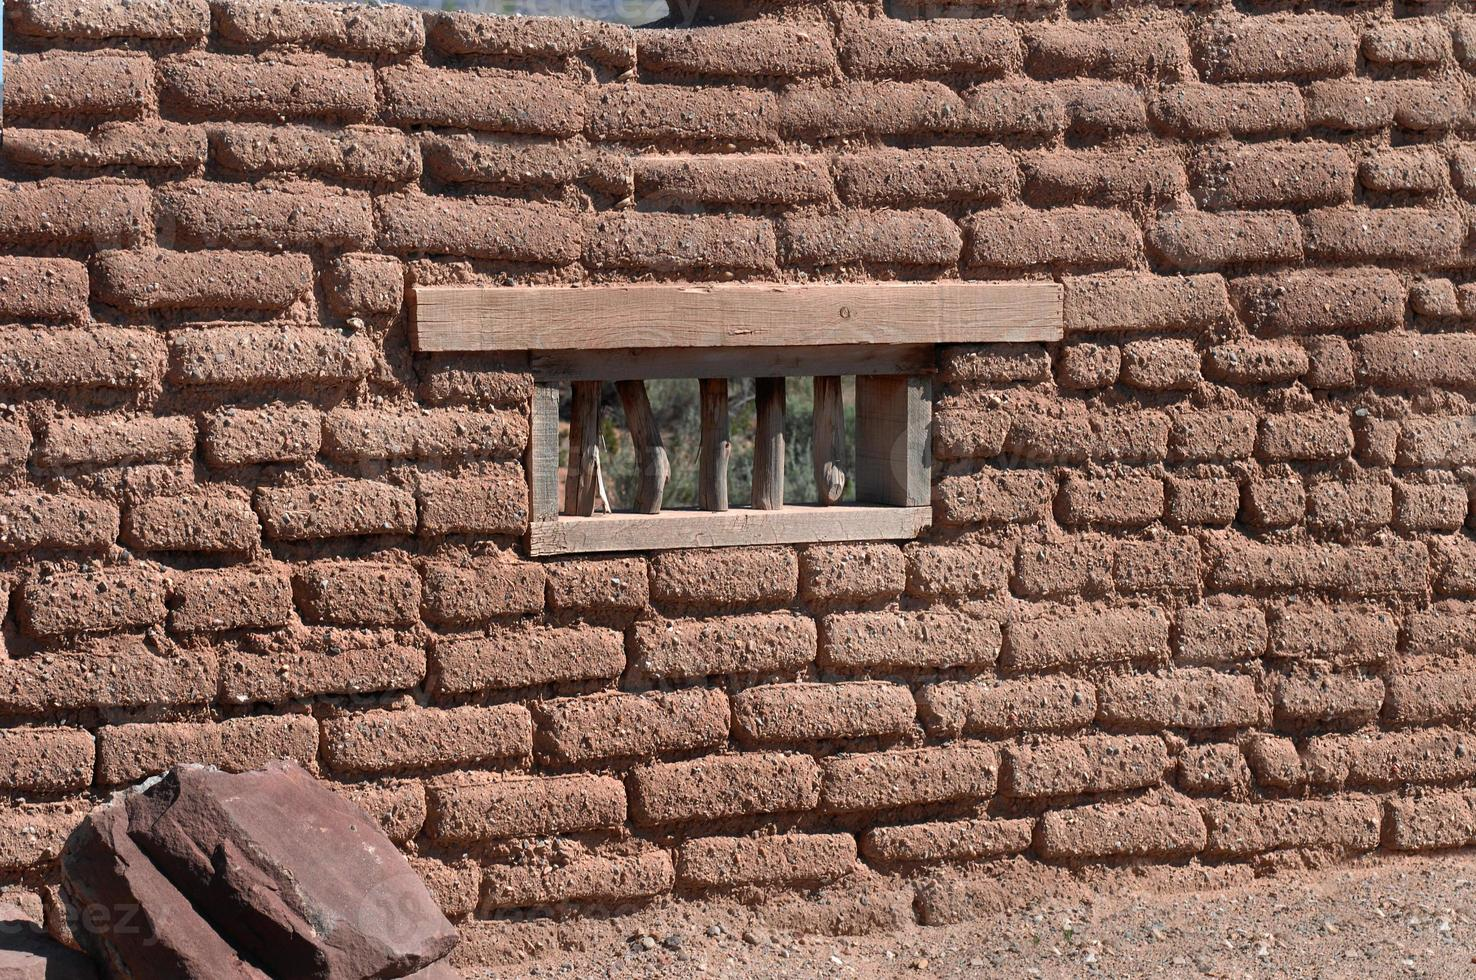 pared de adobe con ventana foto